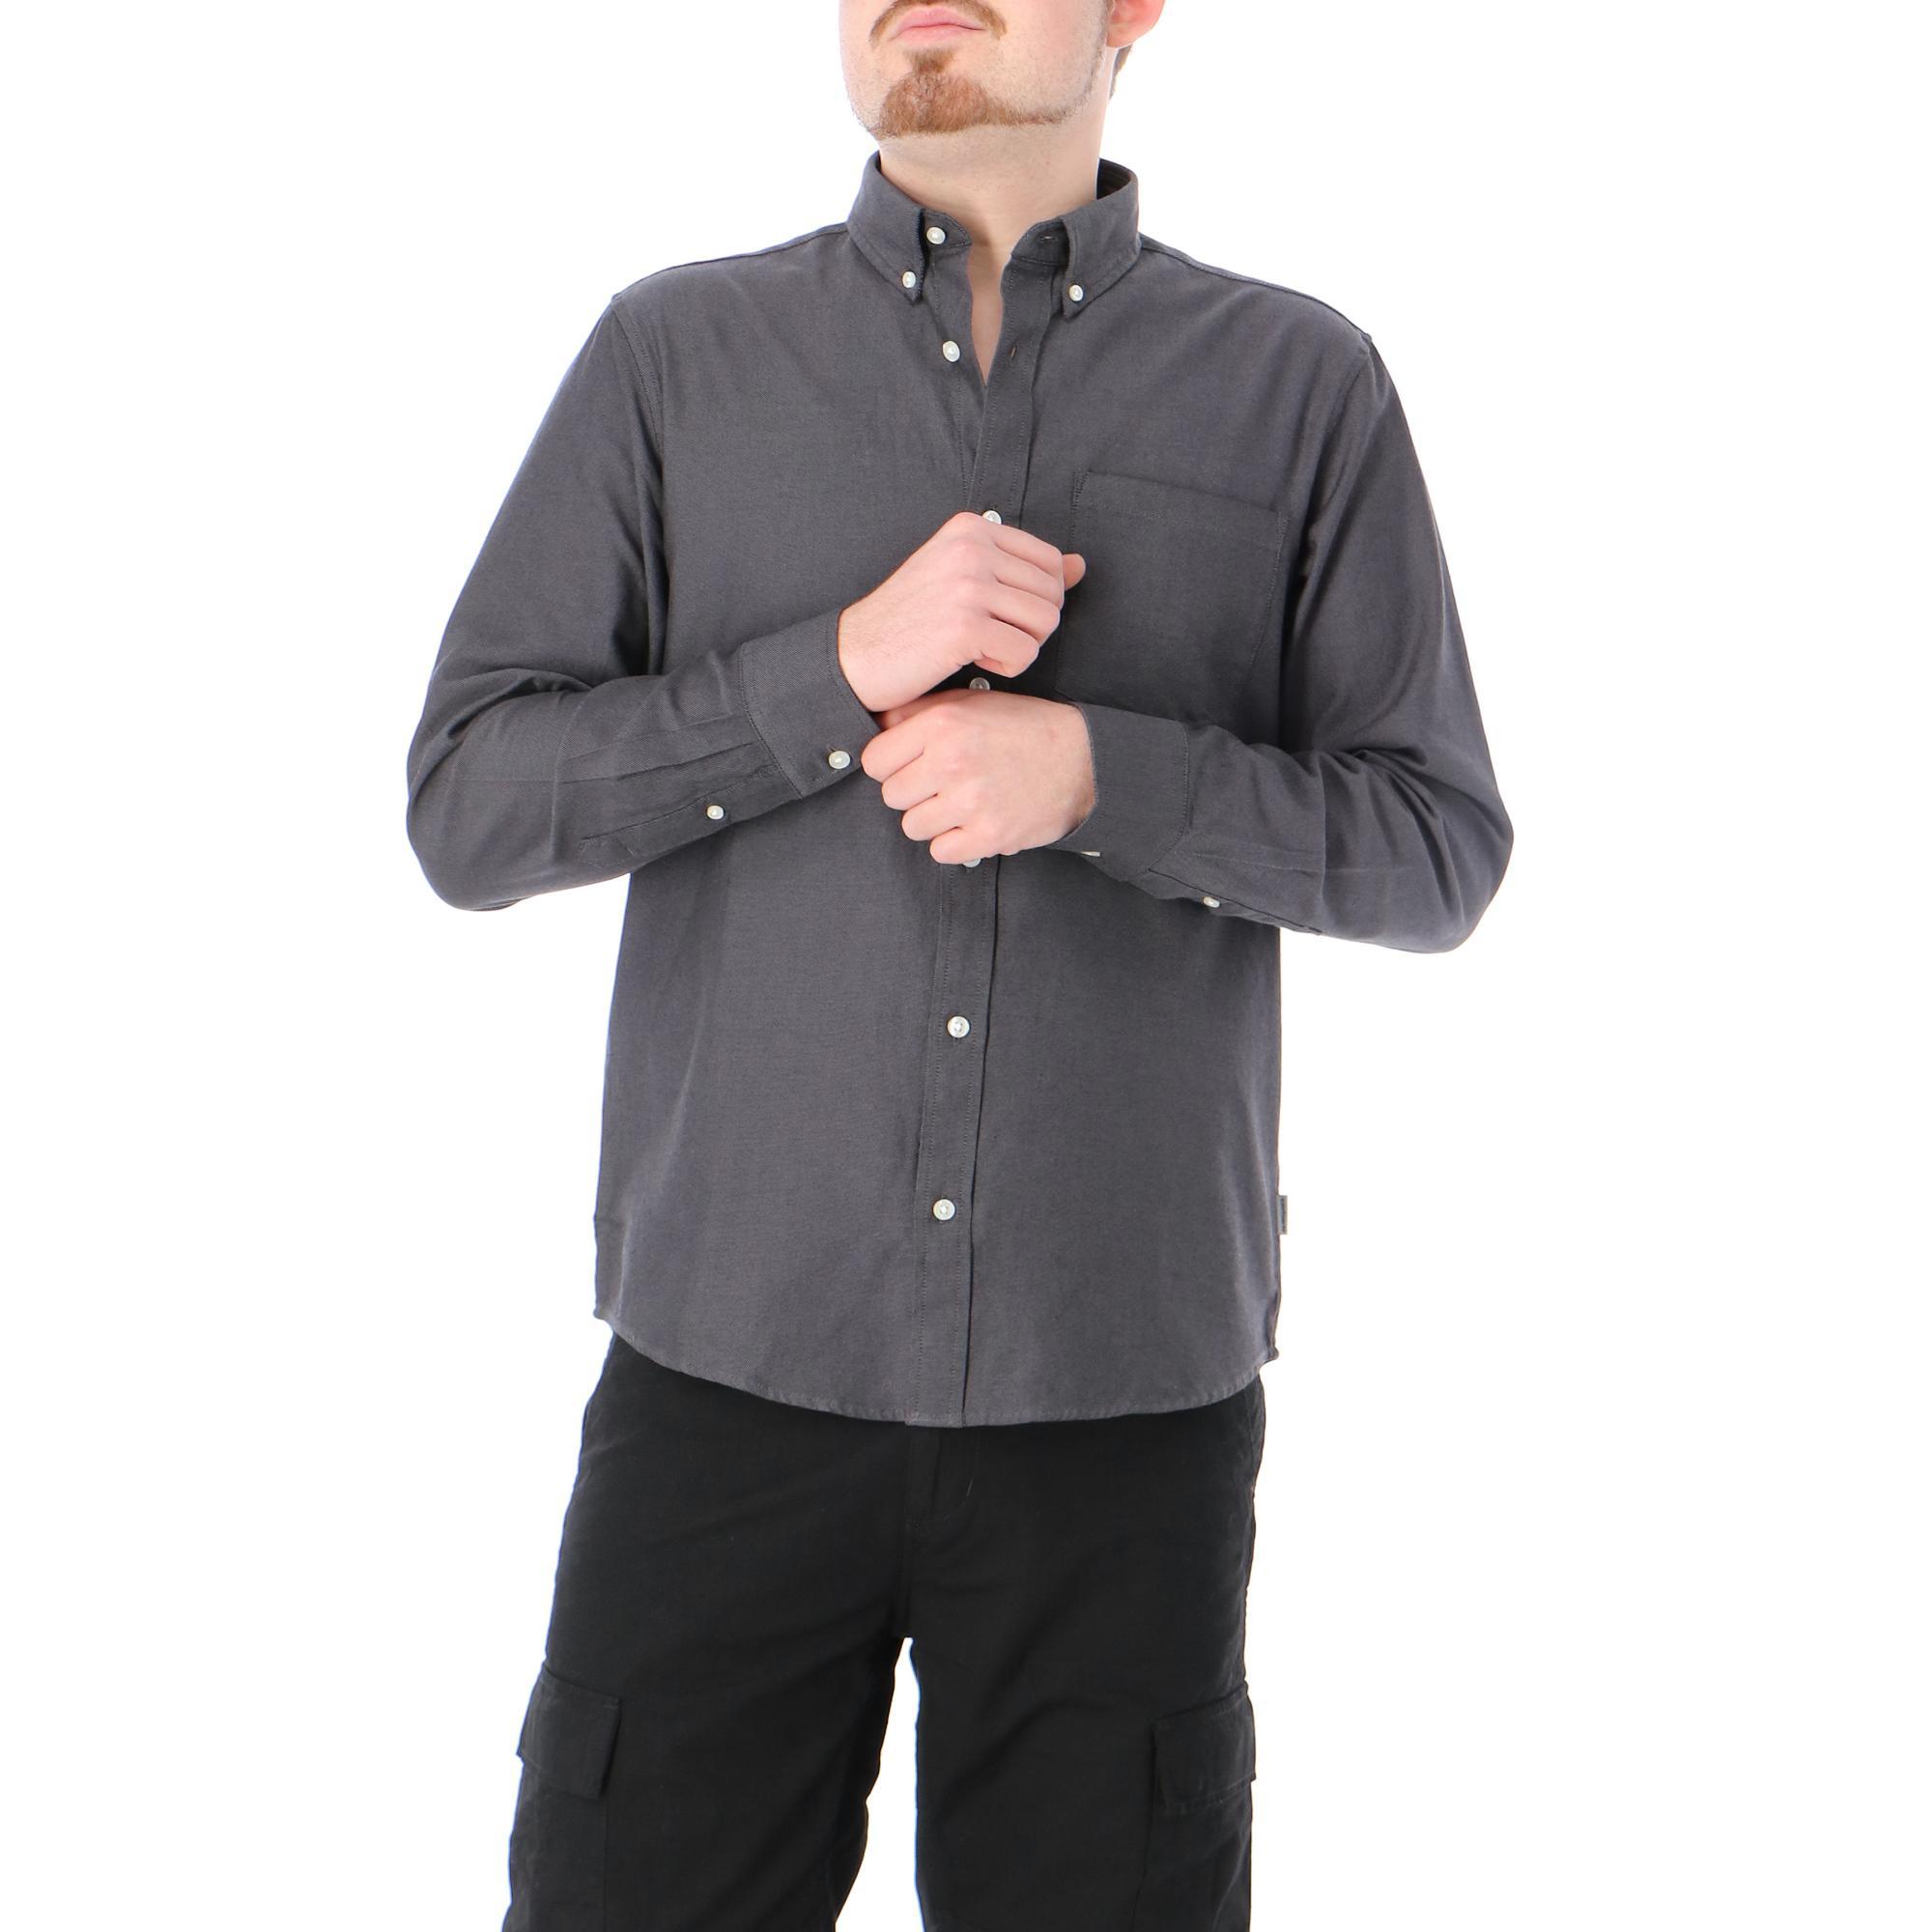 Carhartt L/s Dalton Shirt Black husky heavy rinsed